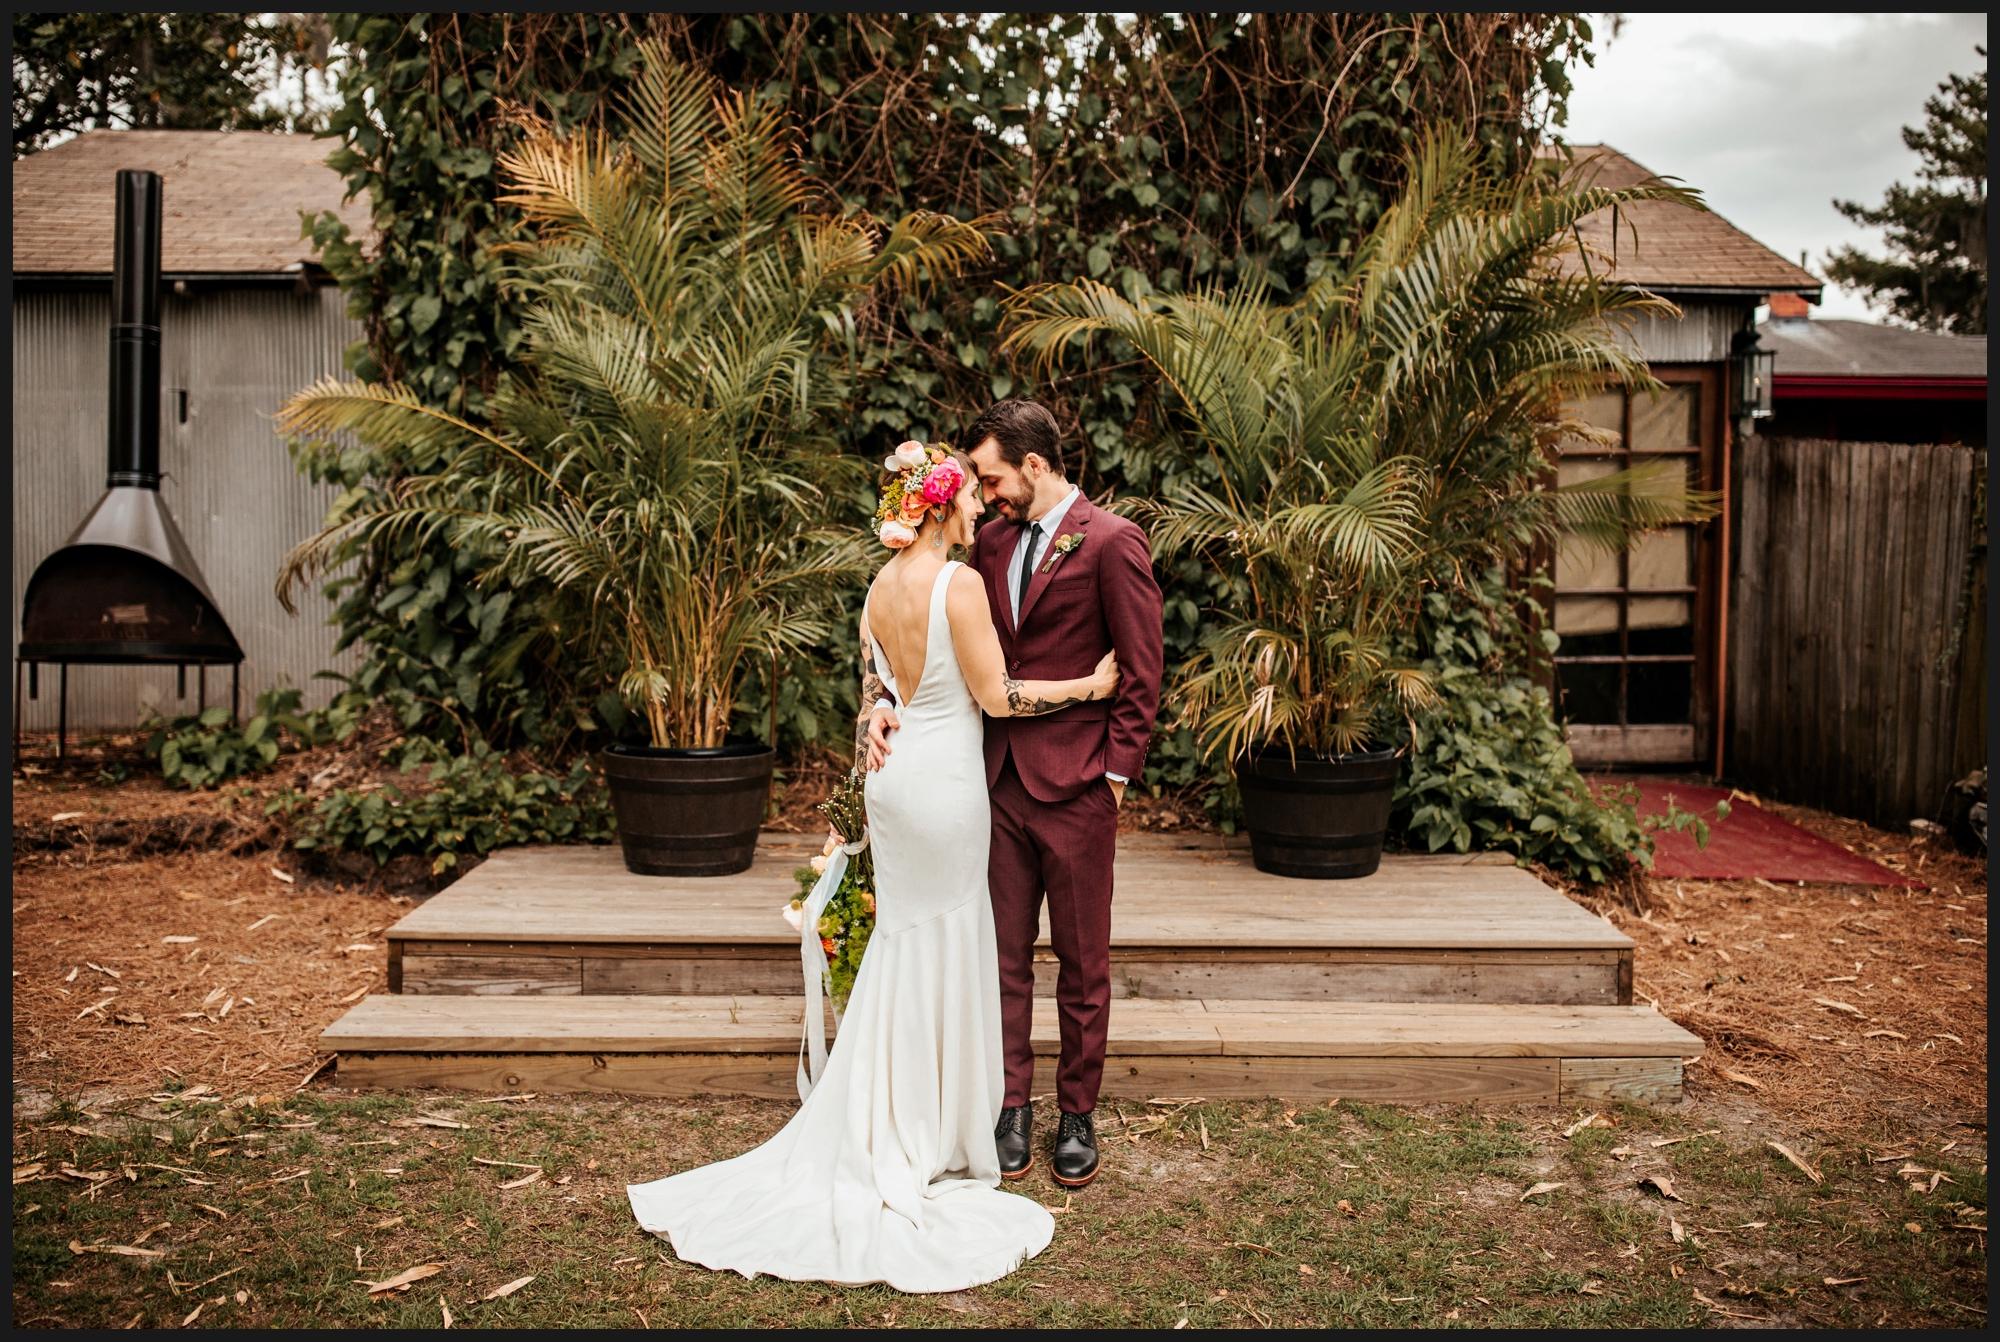 Orlando-Wedding-Photographer-destination-wedding-photographer-florida-wedding-photographer-bohemian-wedding-photographer_2018.jpg